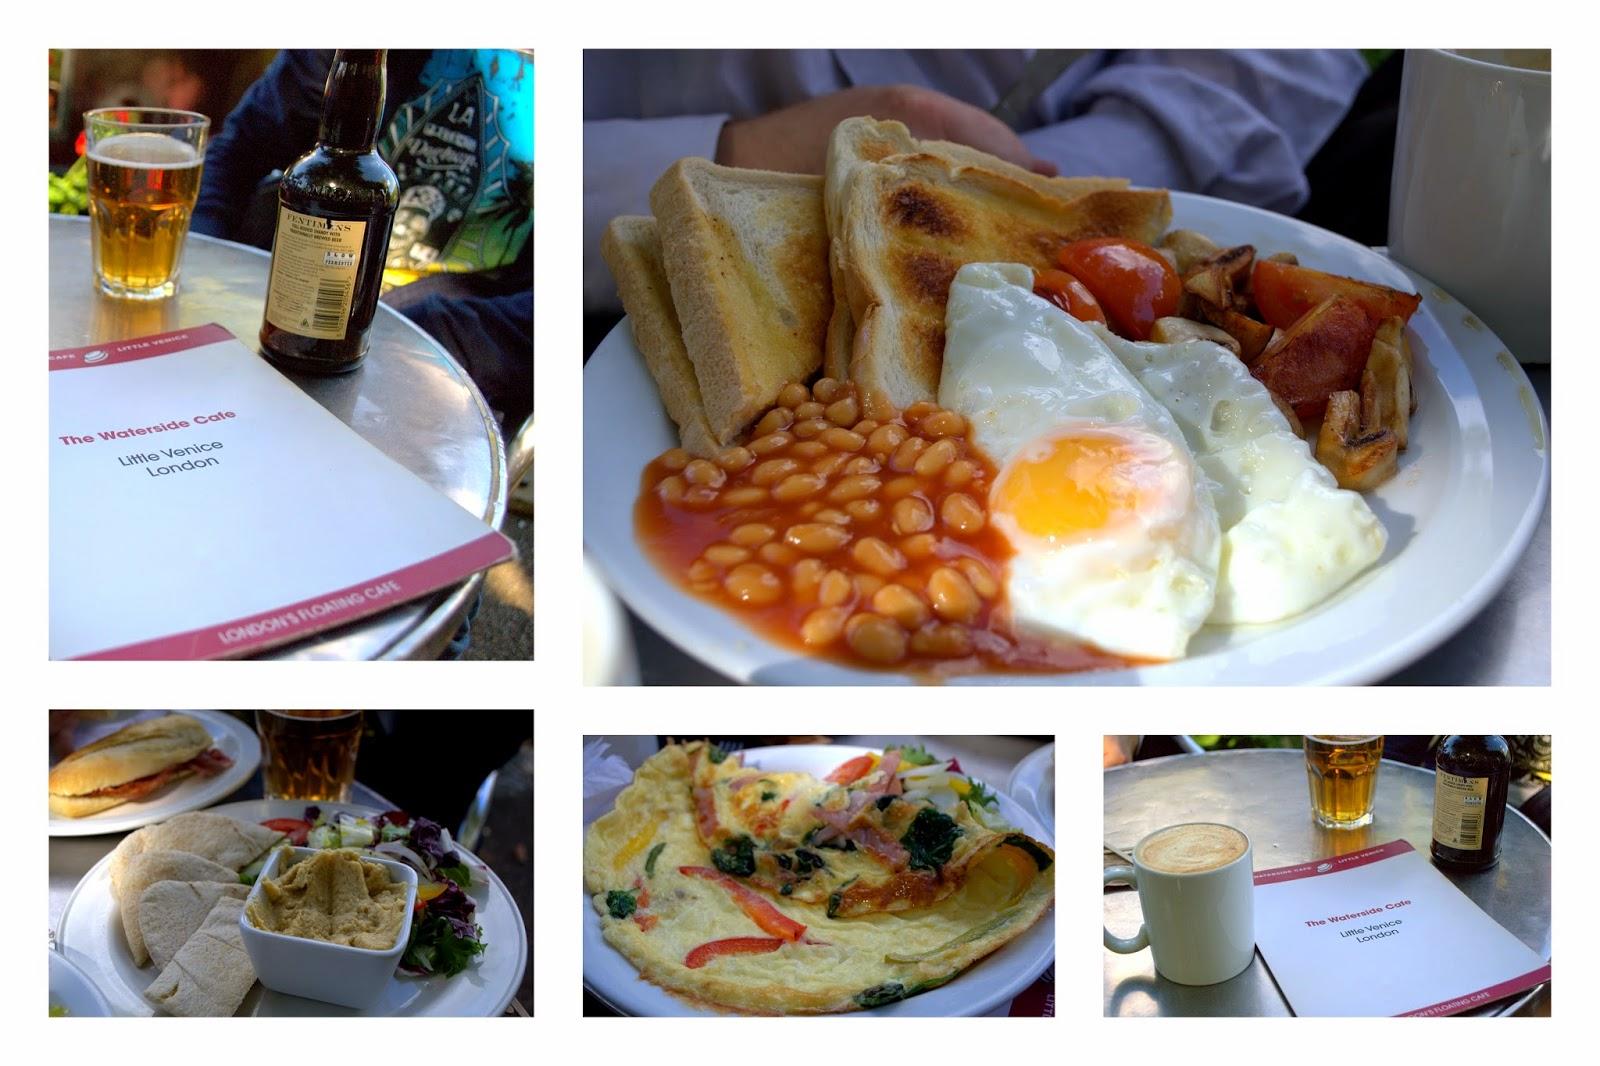 Food at Waterside Cafe Little Venice London Warrick Avenue Paddington